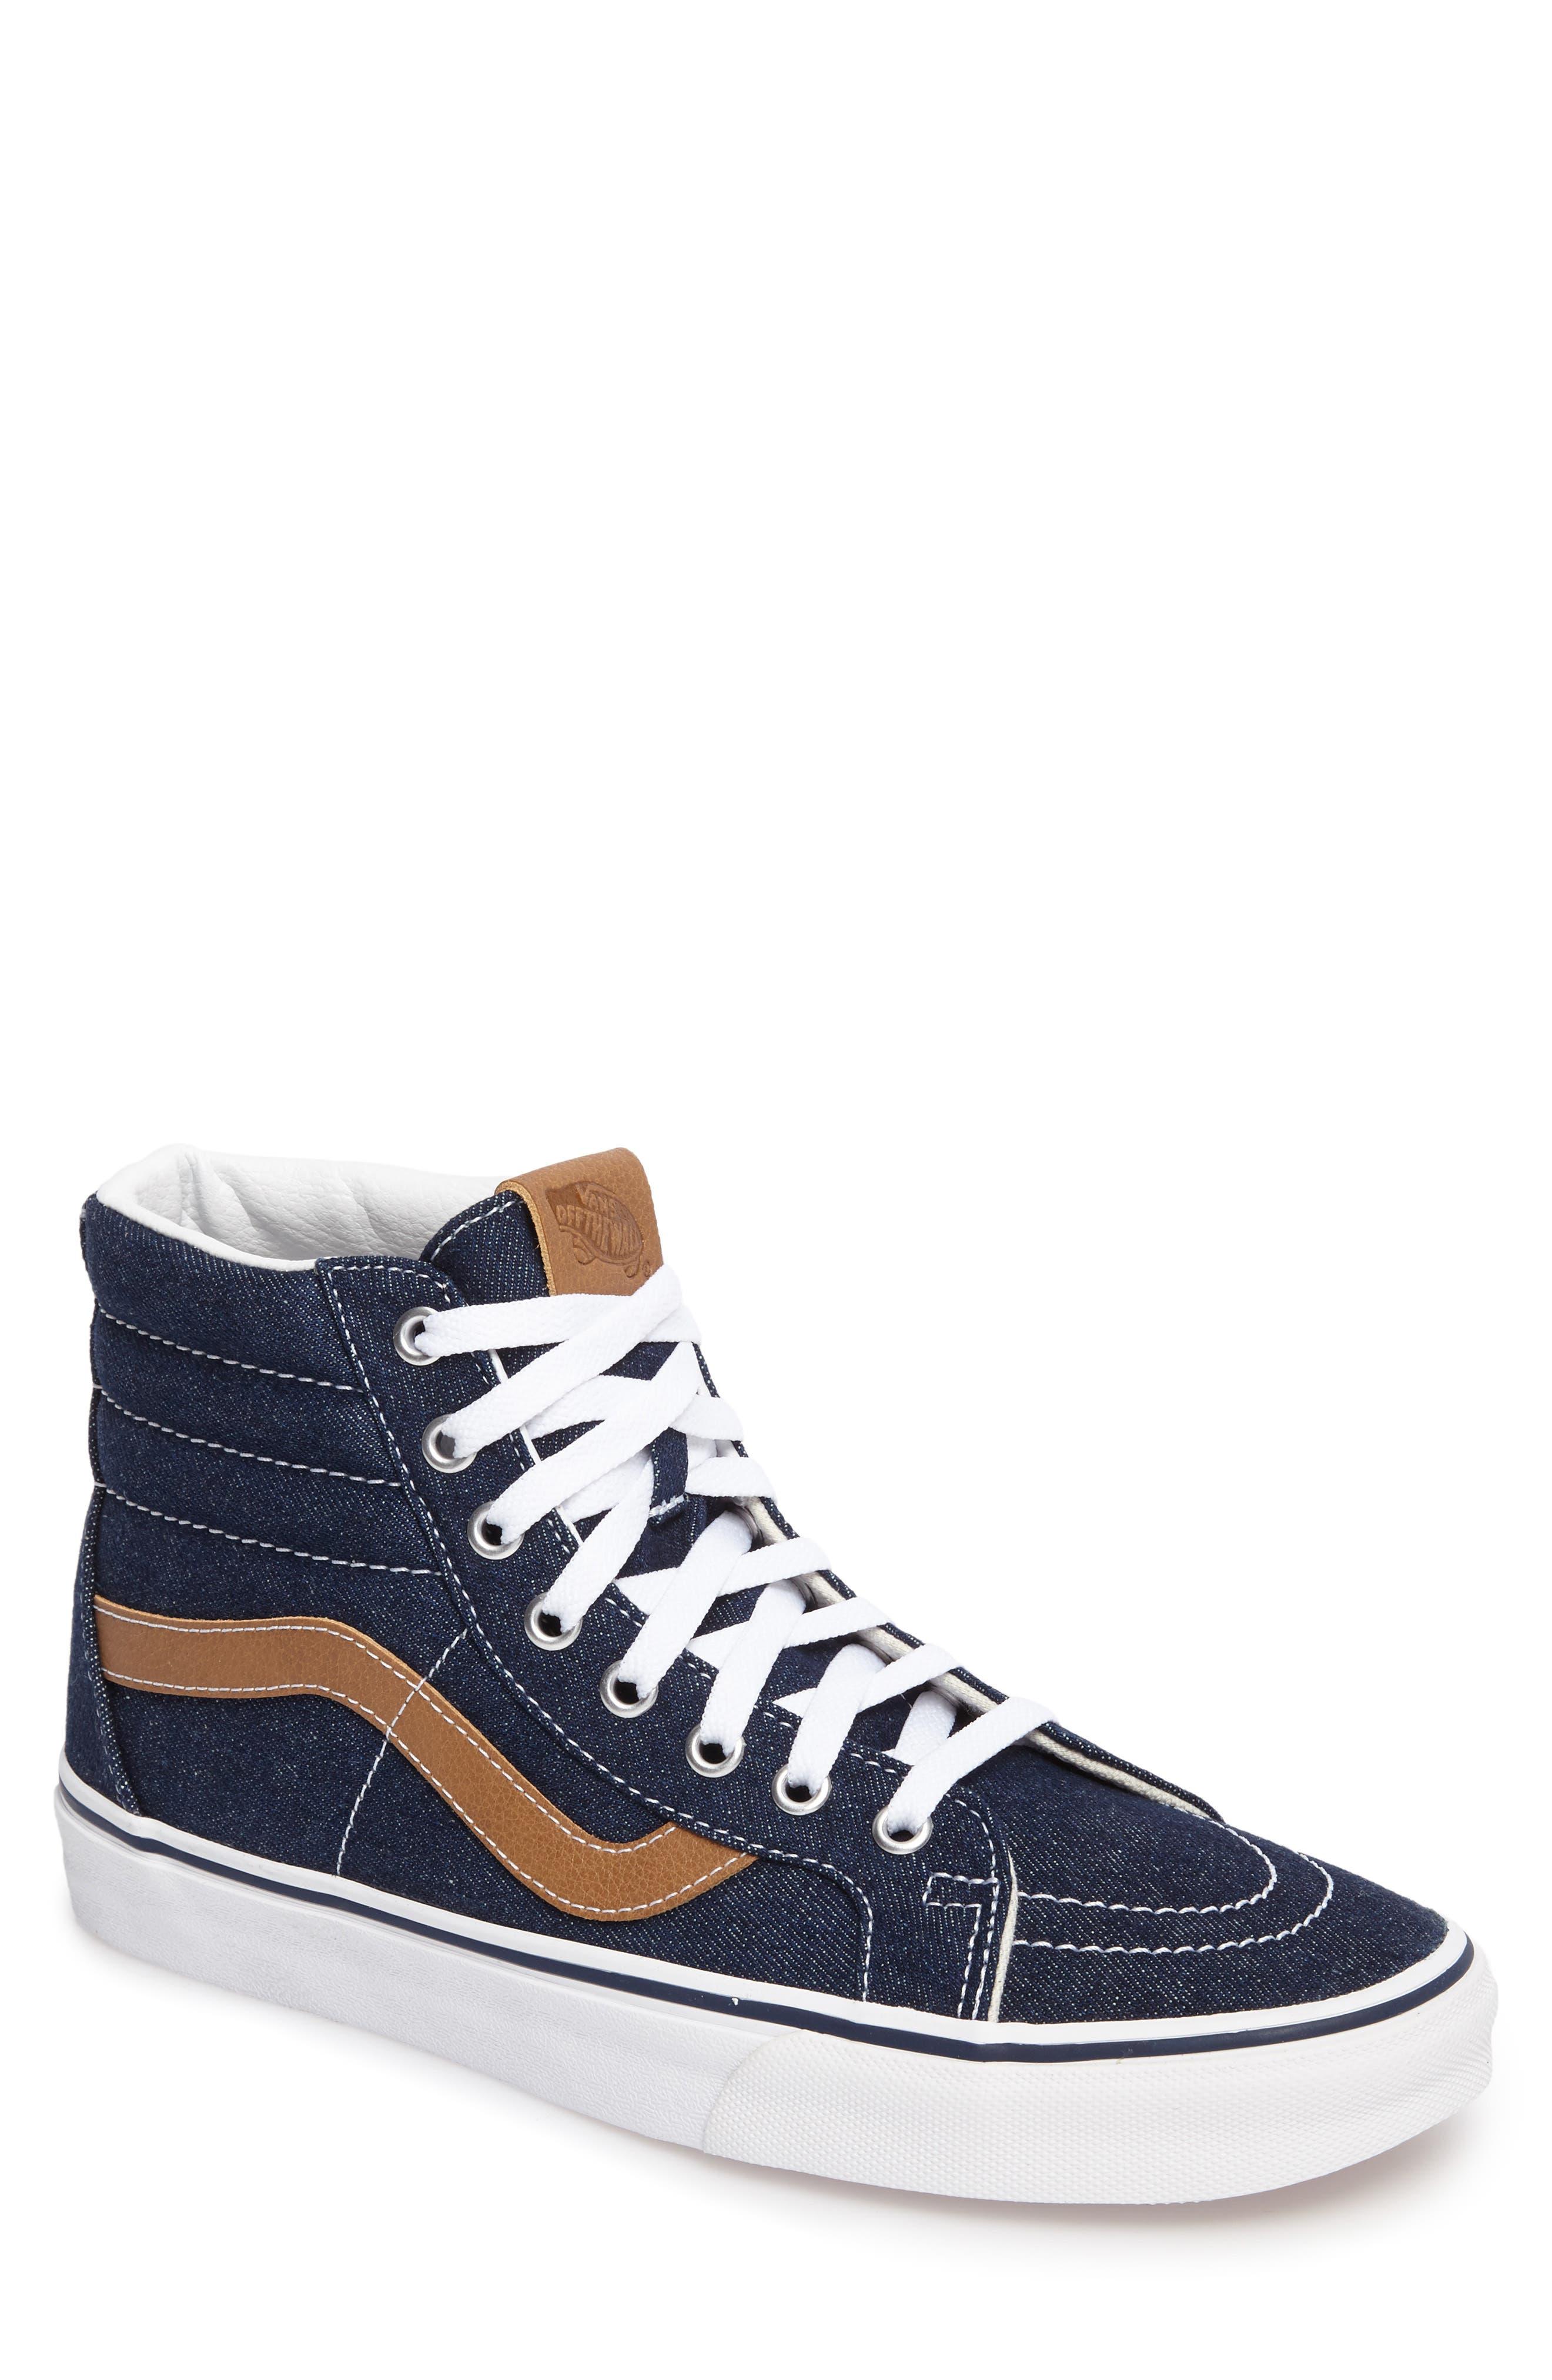 Vans Sk8-Hi Reissue Denim Sneaker (Men)